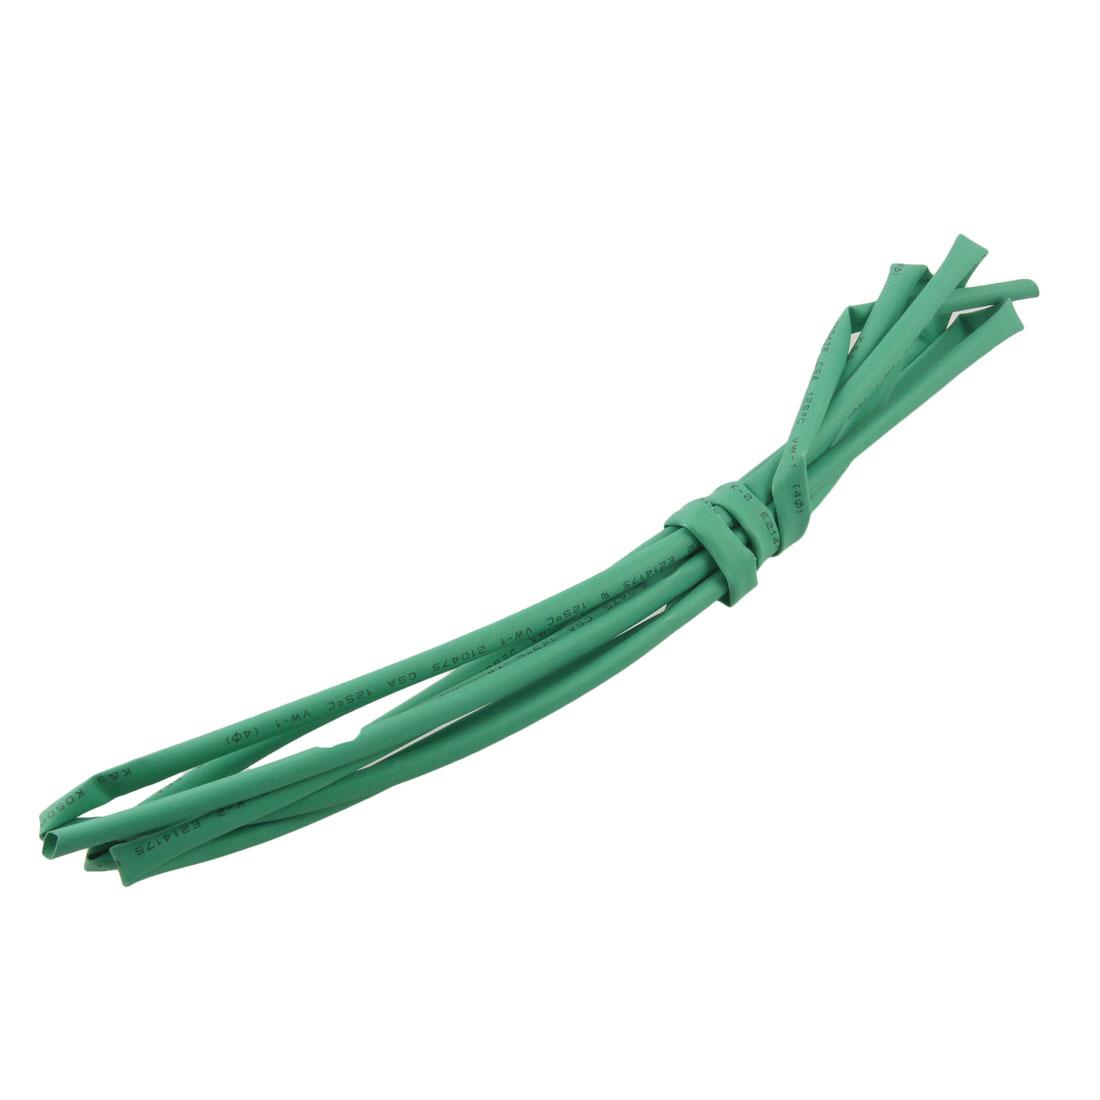 2M Long 4.0mm Dia Ratio 2:1 Heat Shrinking Shrinkable Tube Tubing Green